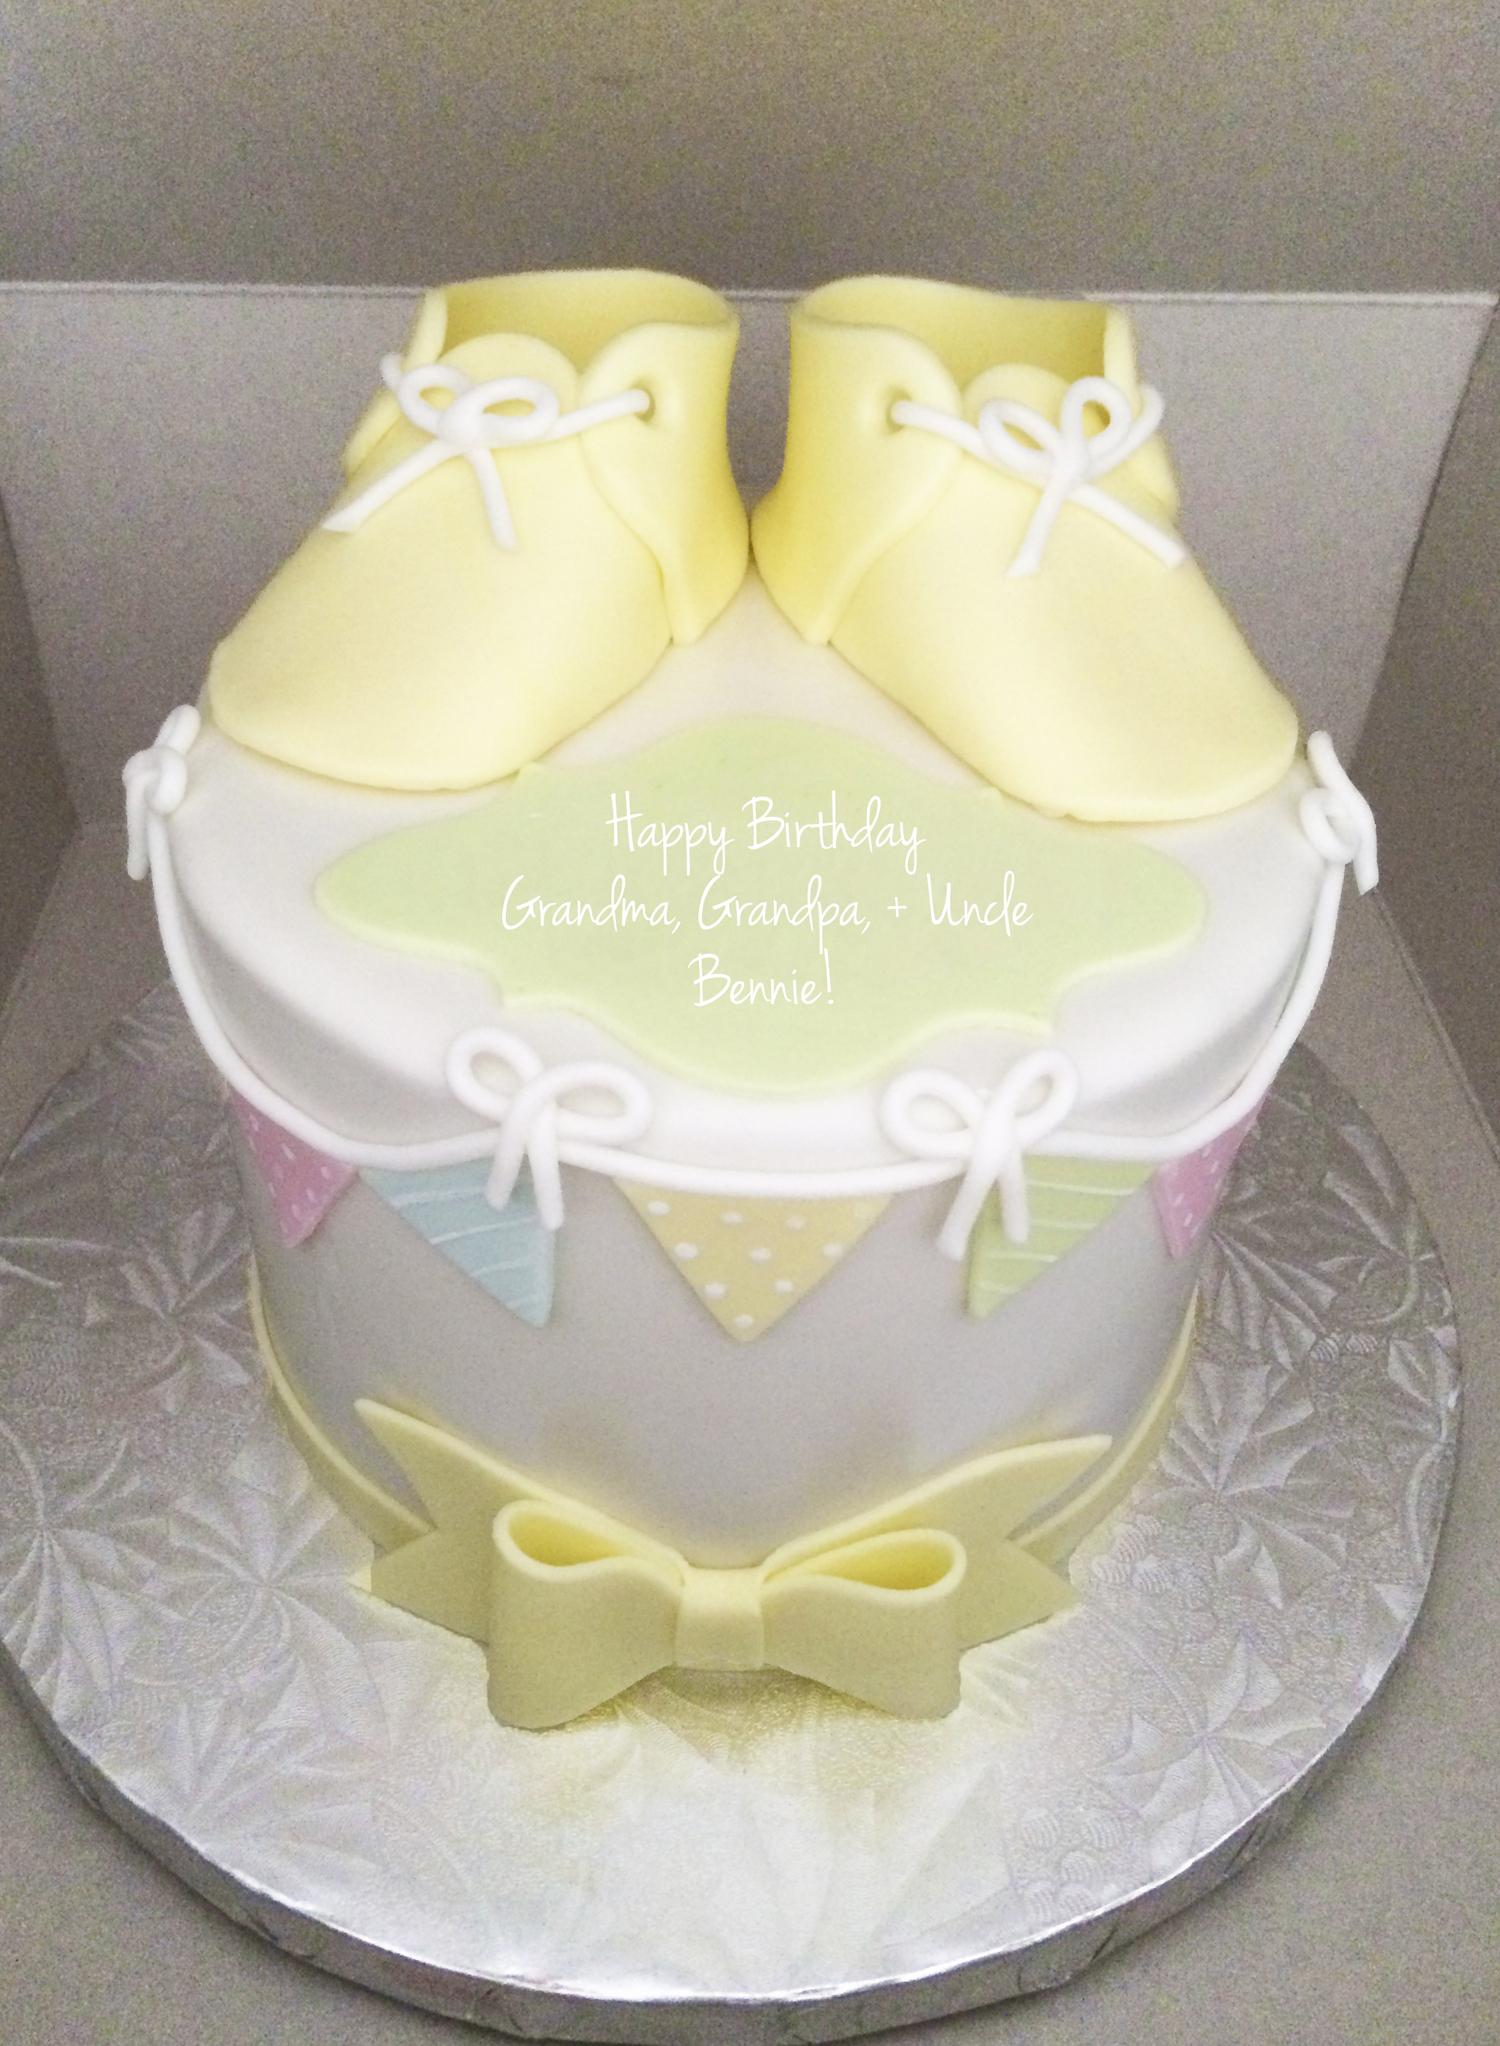 pregnancy announcement cake ideas